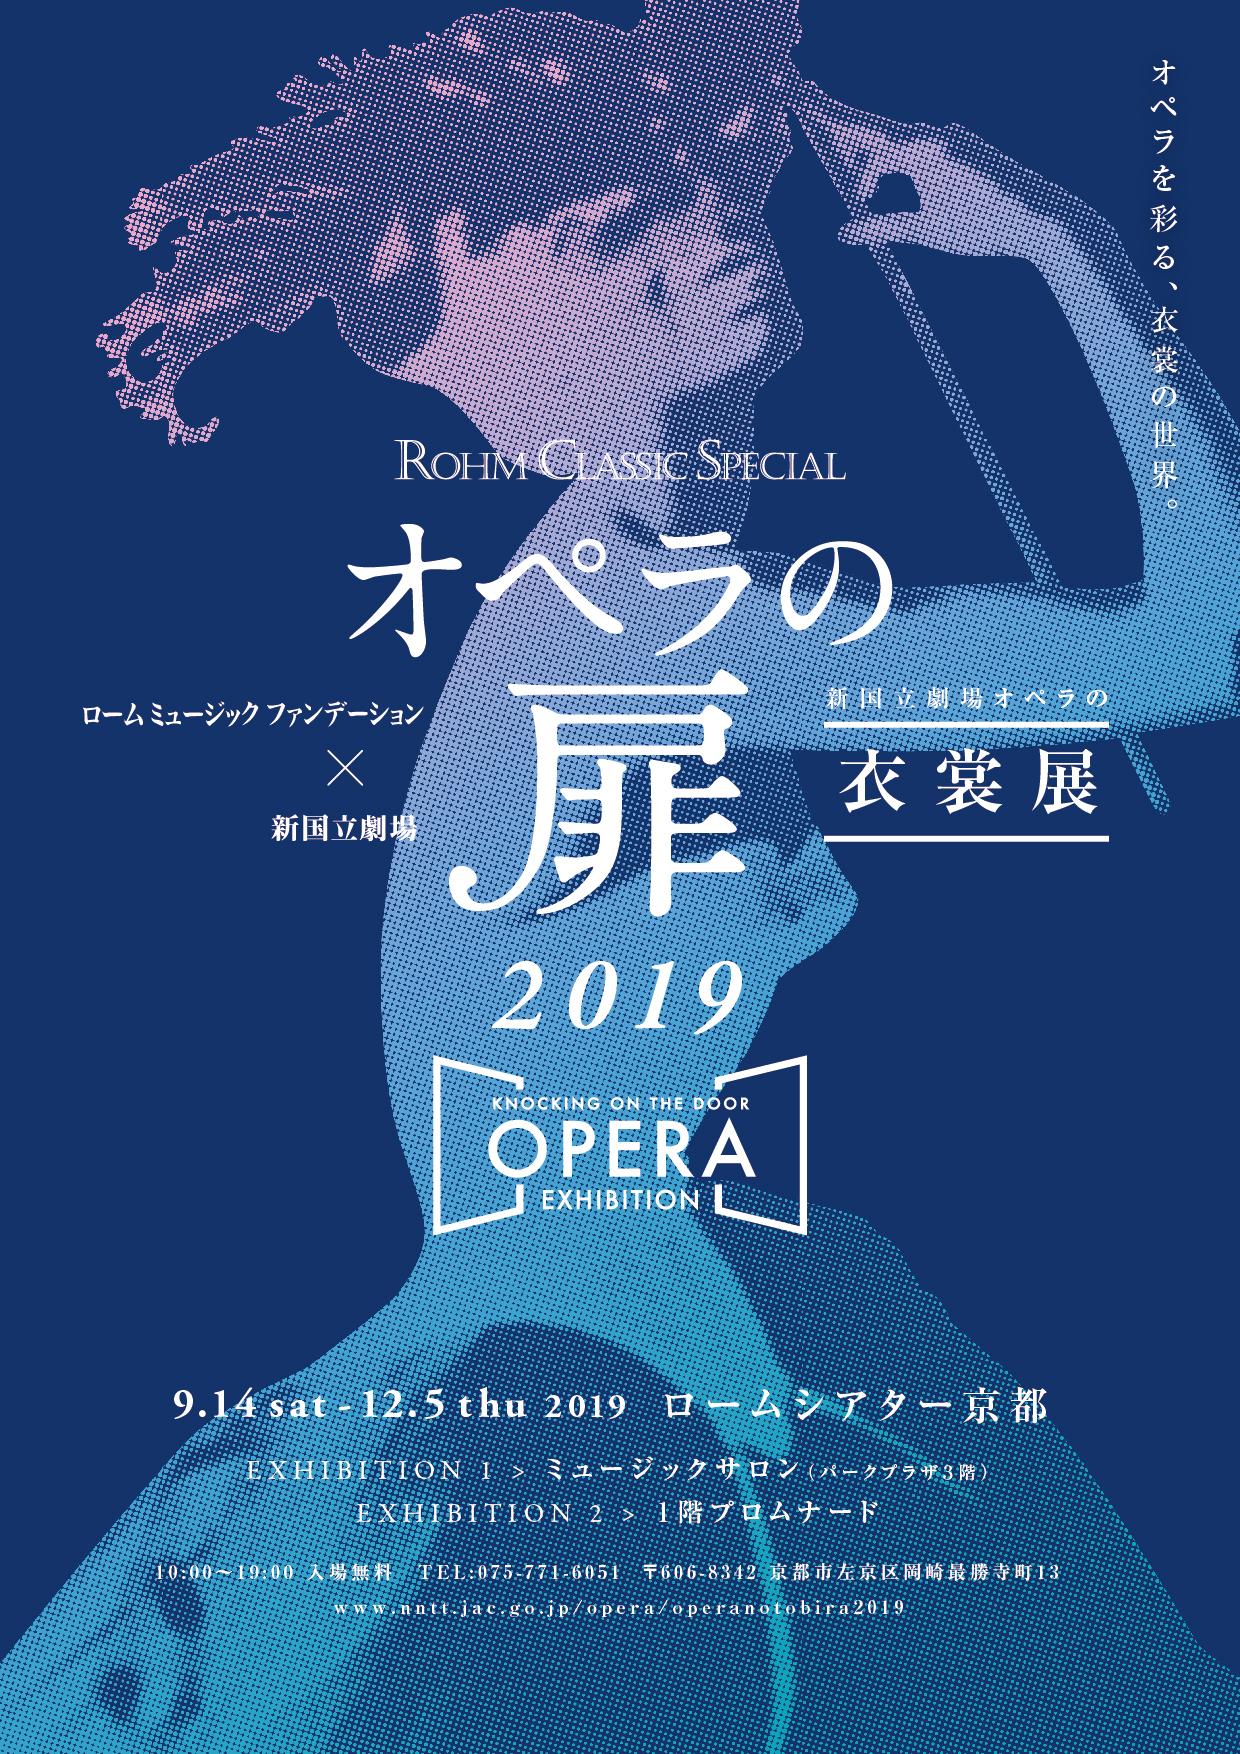 https://cms.nntt.jac.go.jp/opera/news/upload_files/190730-01.jpg